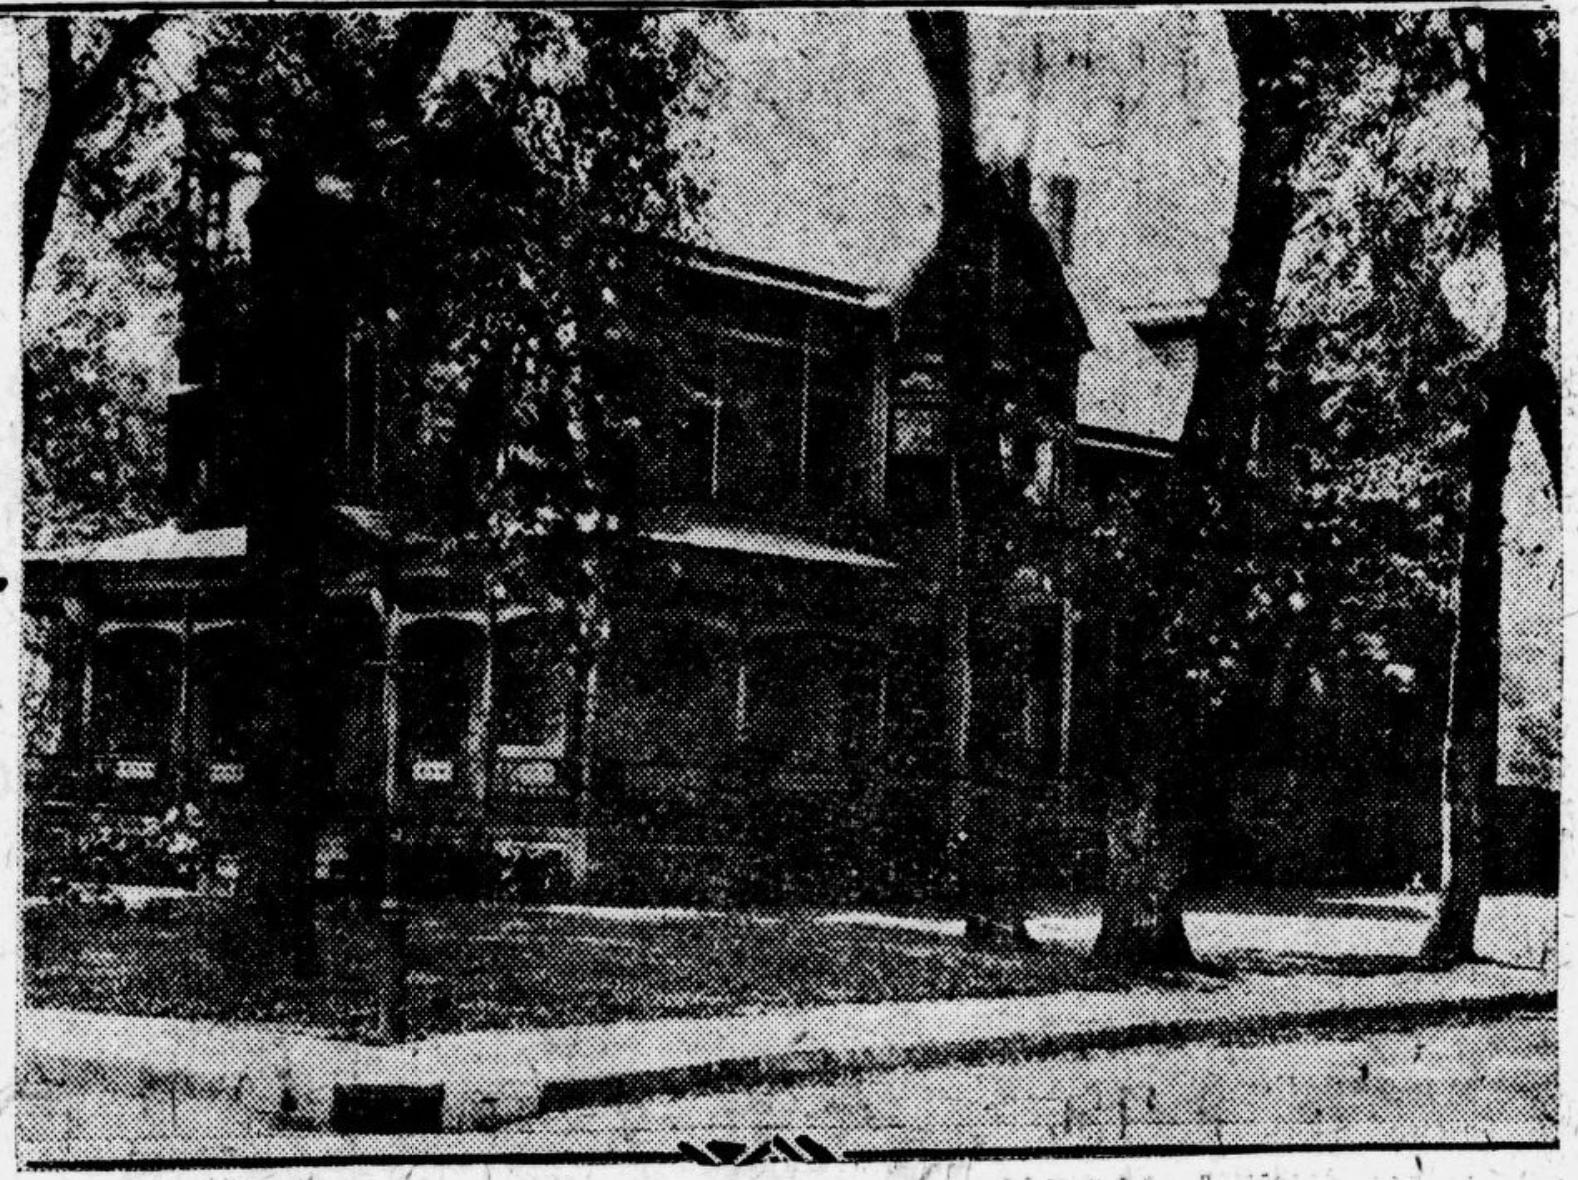 Omaha Salvation Army Rescue and Maternity Home at 3824 North 24th Street, North Omaha, Nebraska